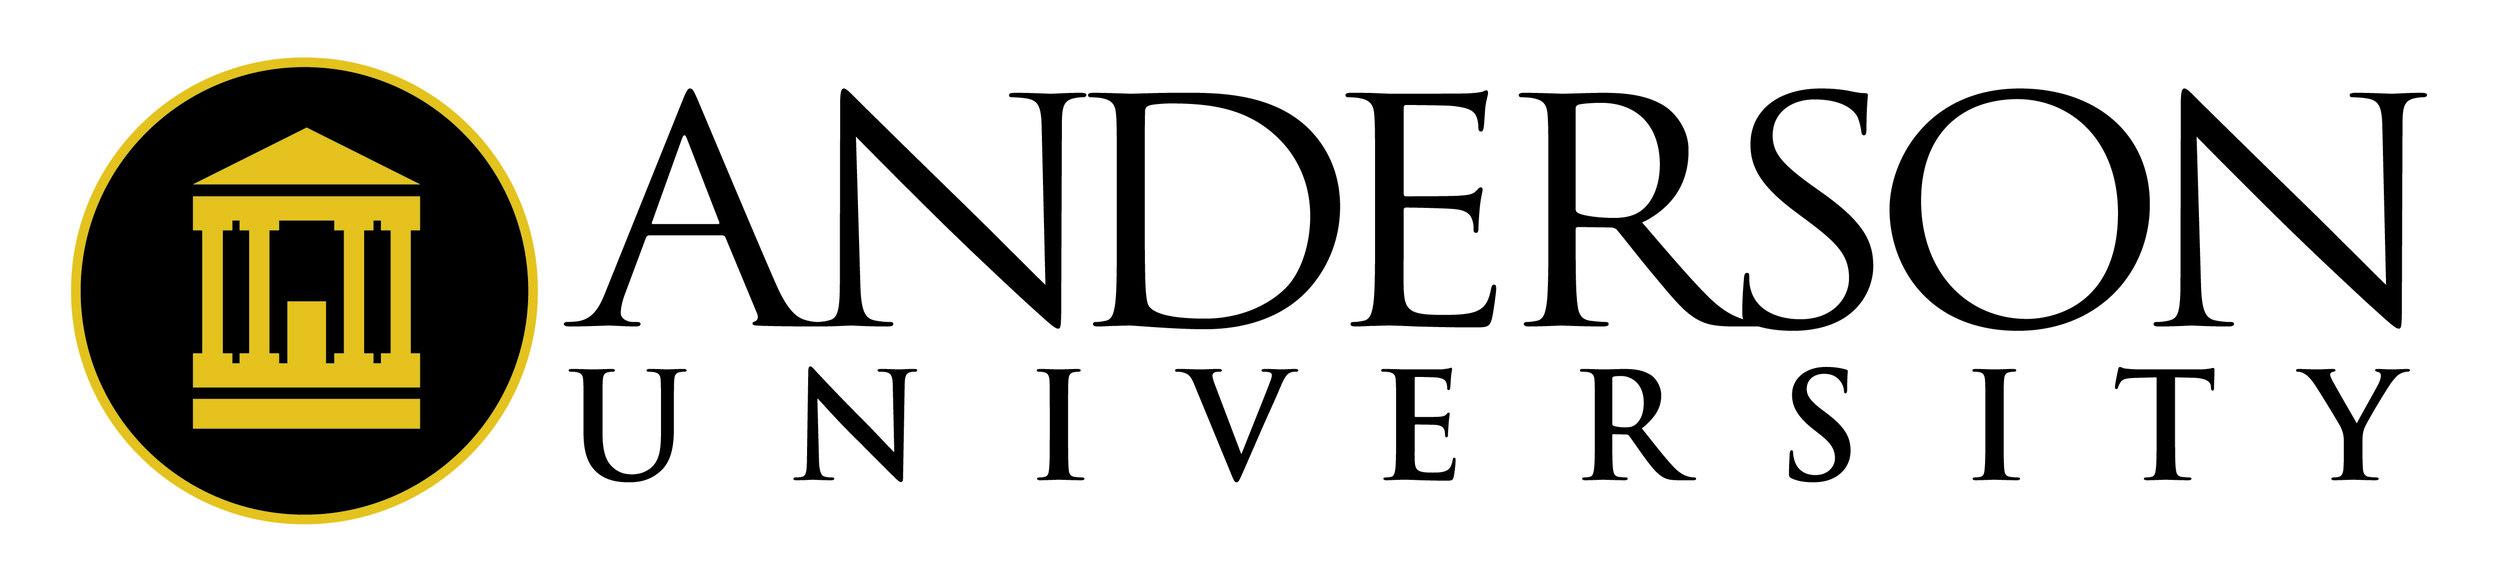 2019 HRLU - Approved logo - Anderson University.jpg